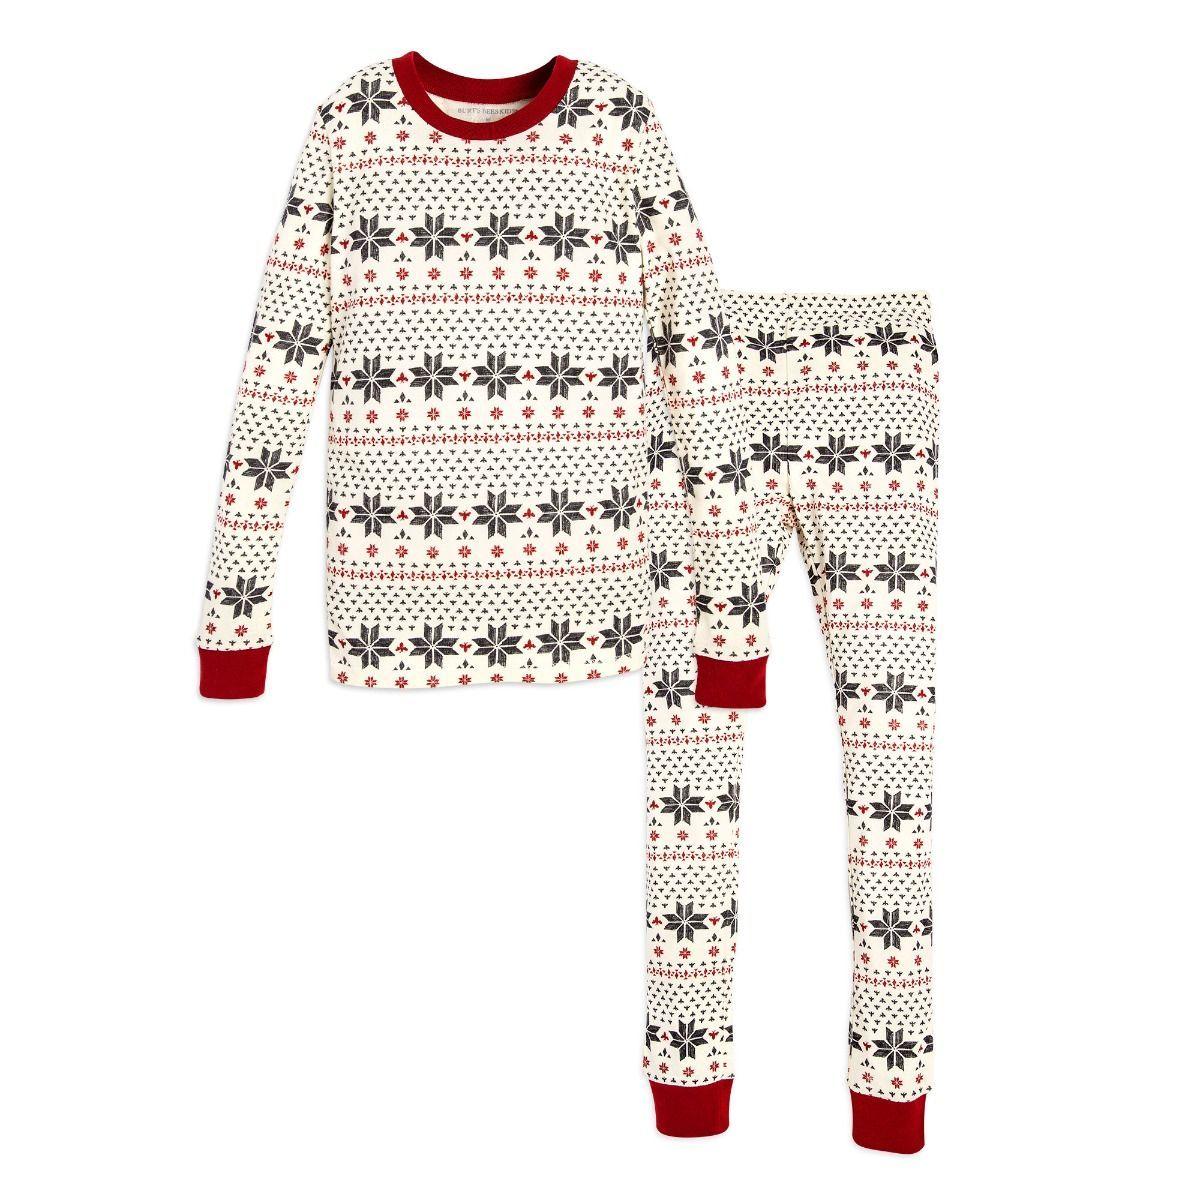 20 Best Kids Christmas Pajamas - Cutest Christmas Sleepwear for Children